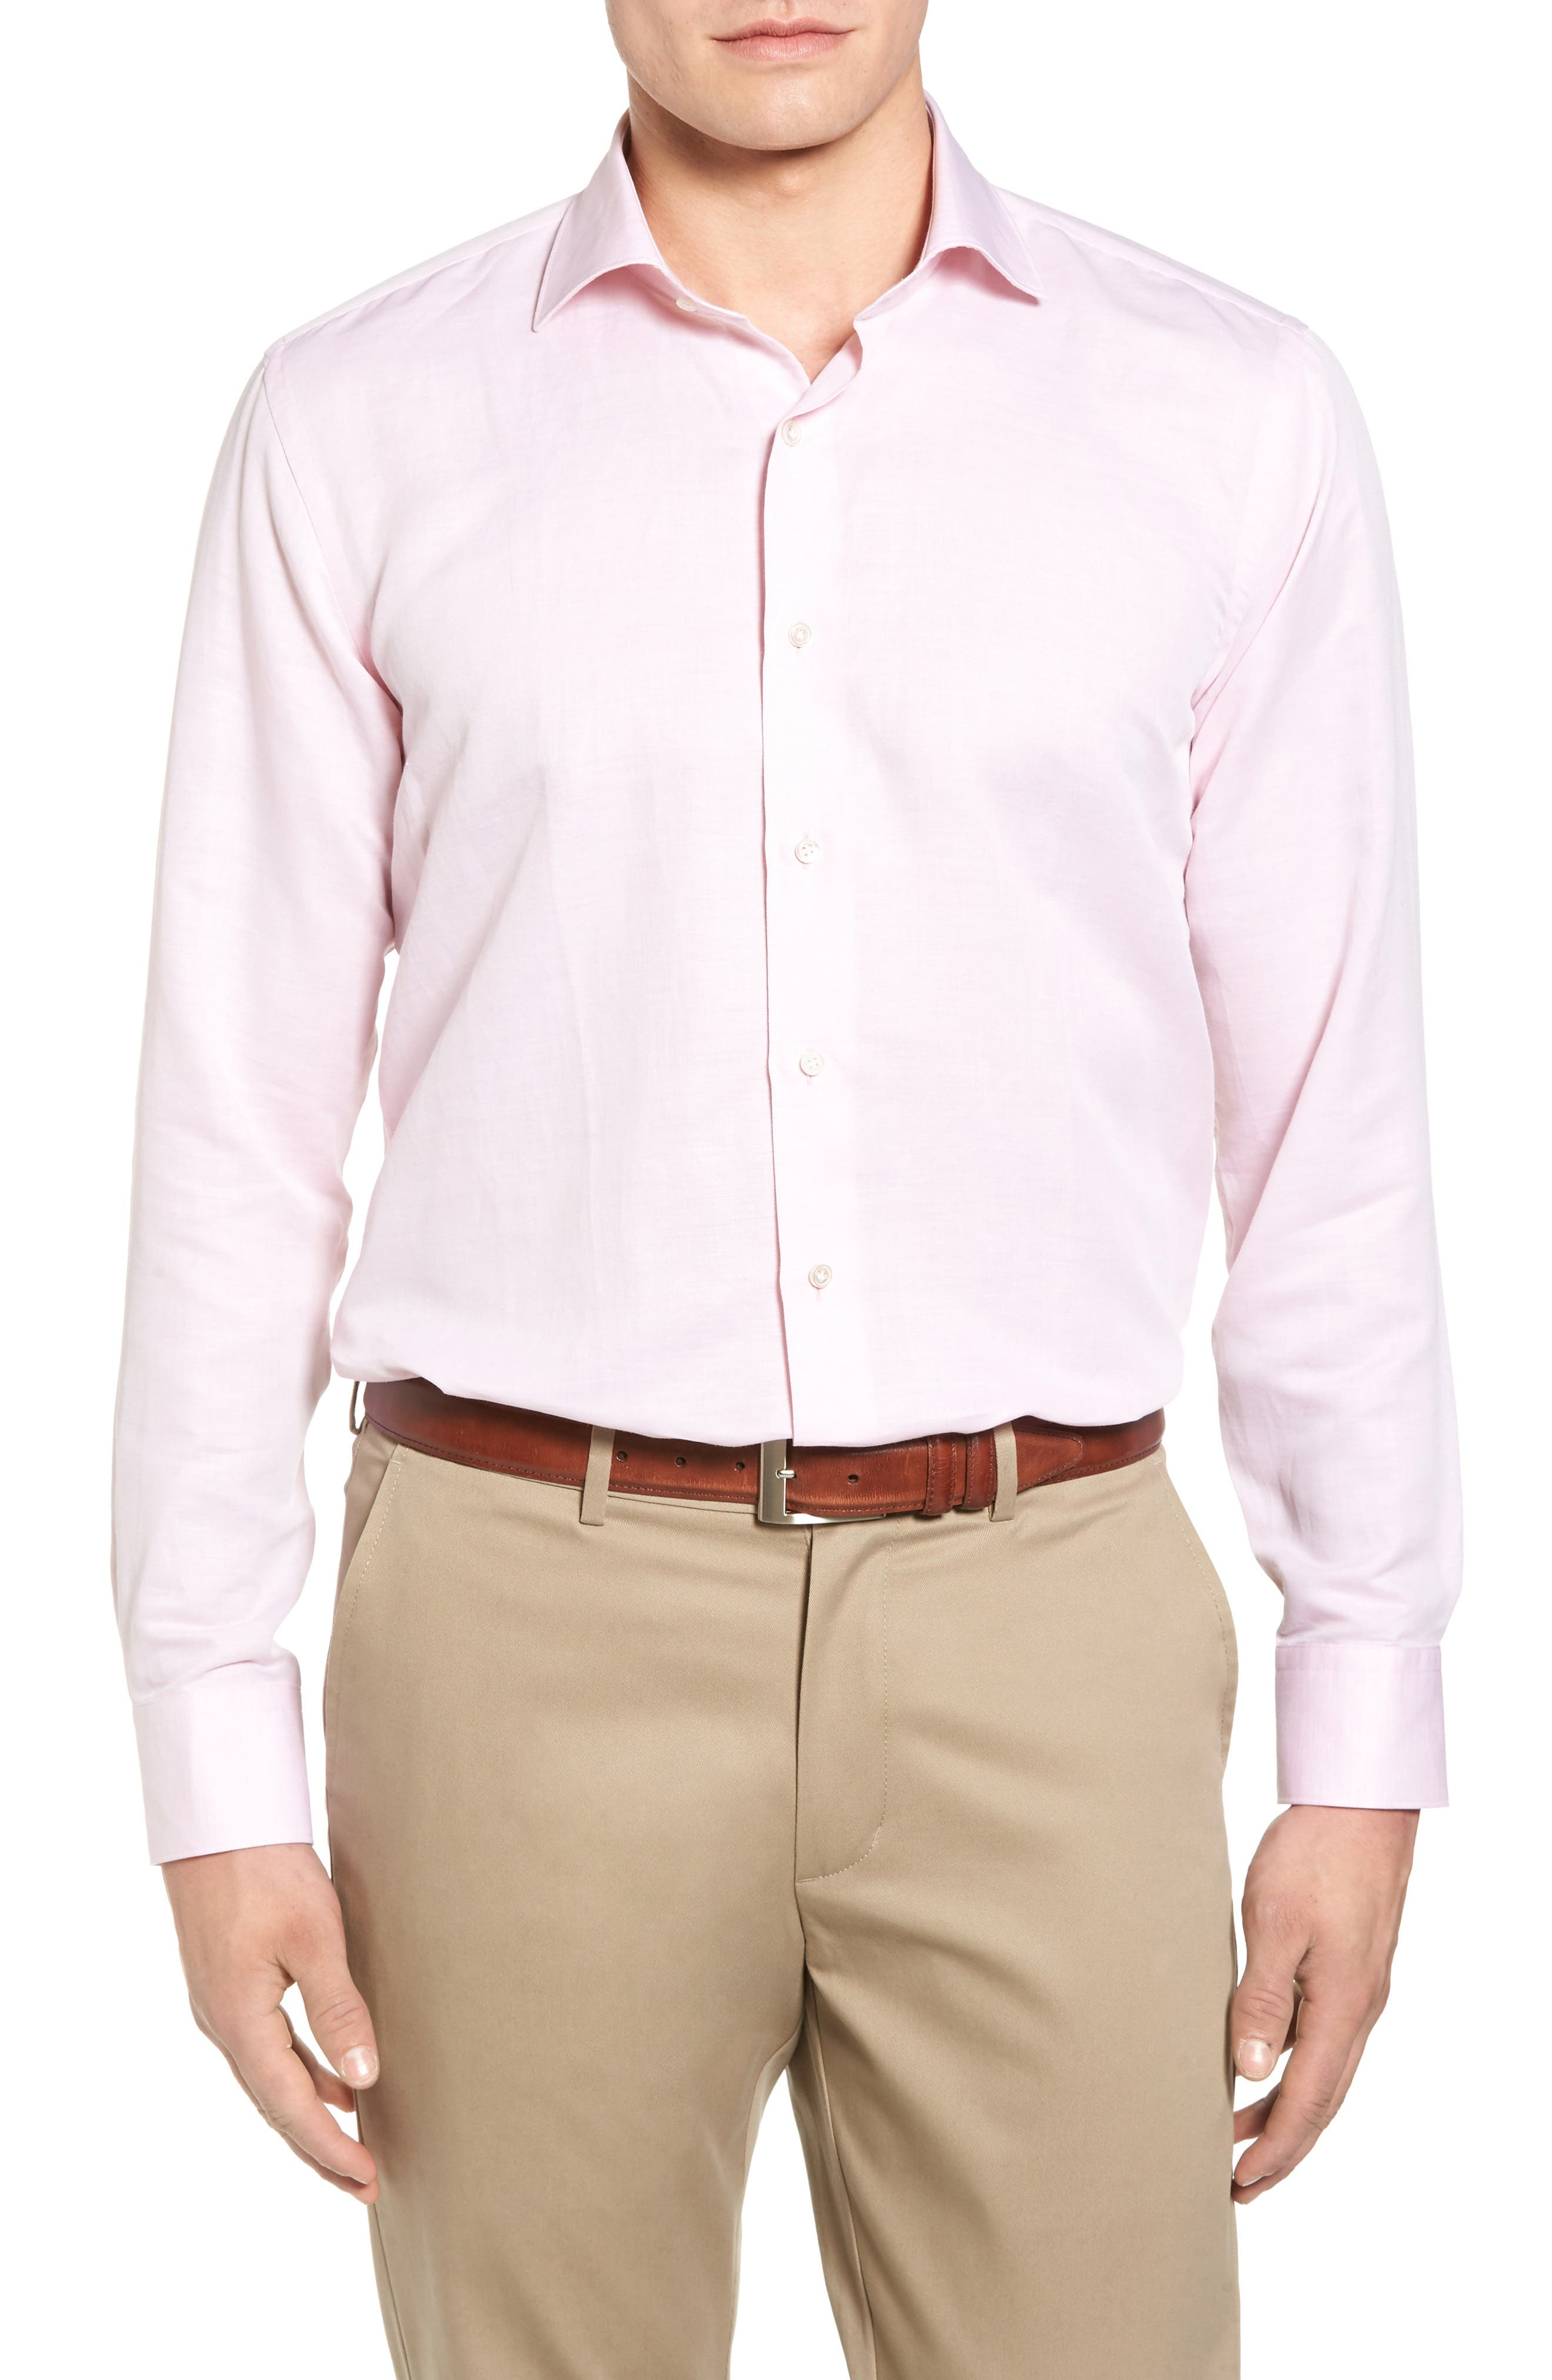 PETER MILLAR COLLECTION,                             Linen & Cotton Sport Shirt,                             Main thumbnail 1, color,                             626